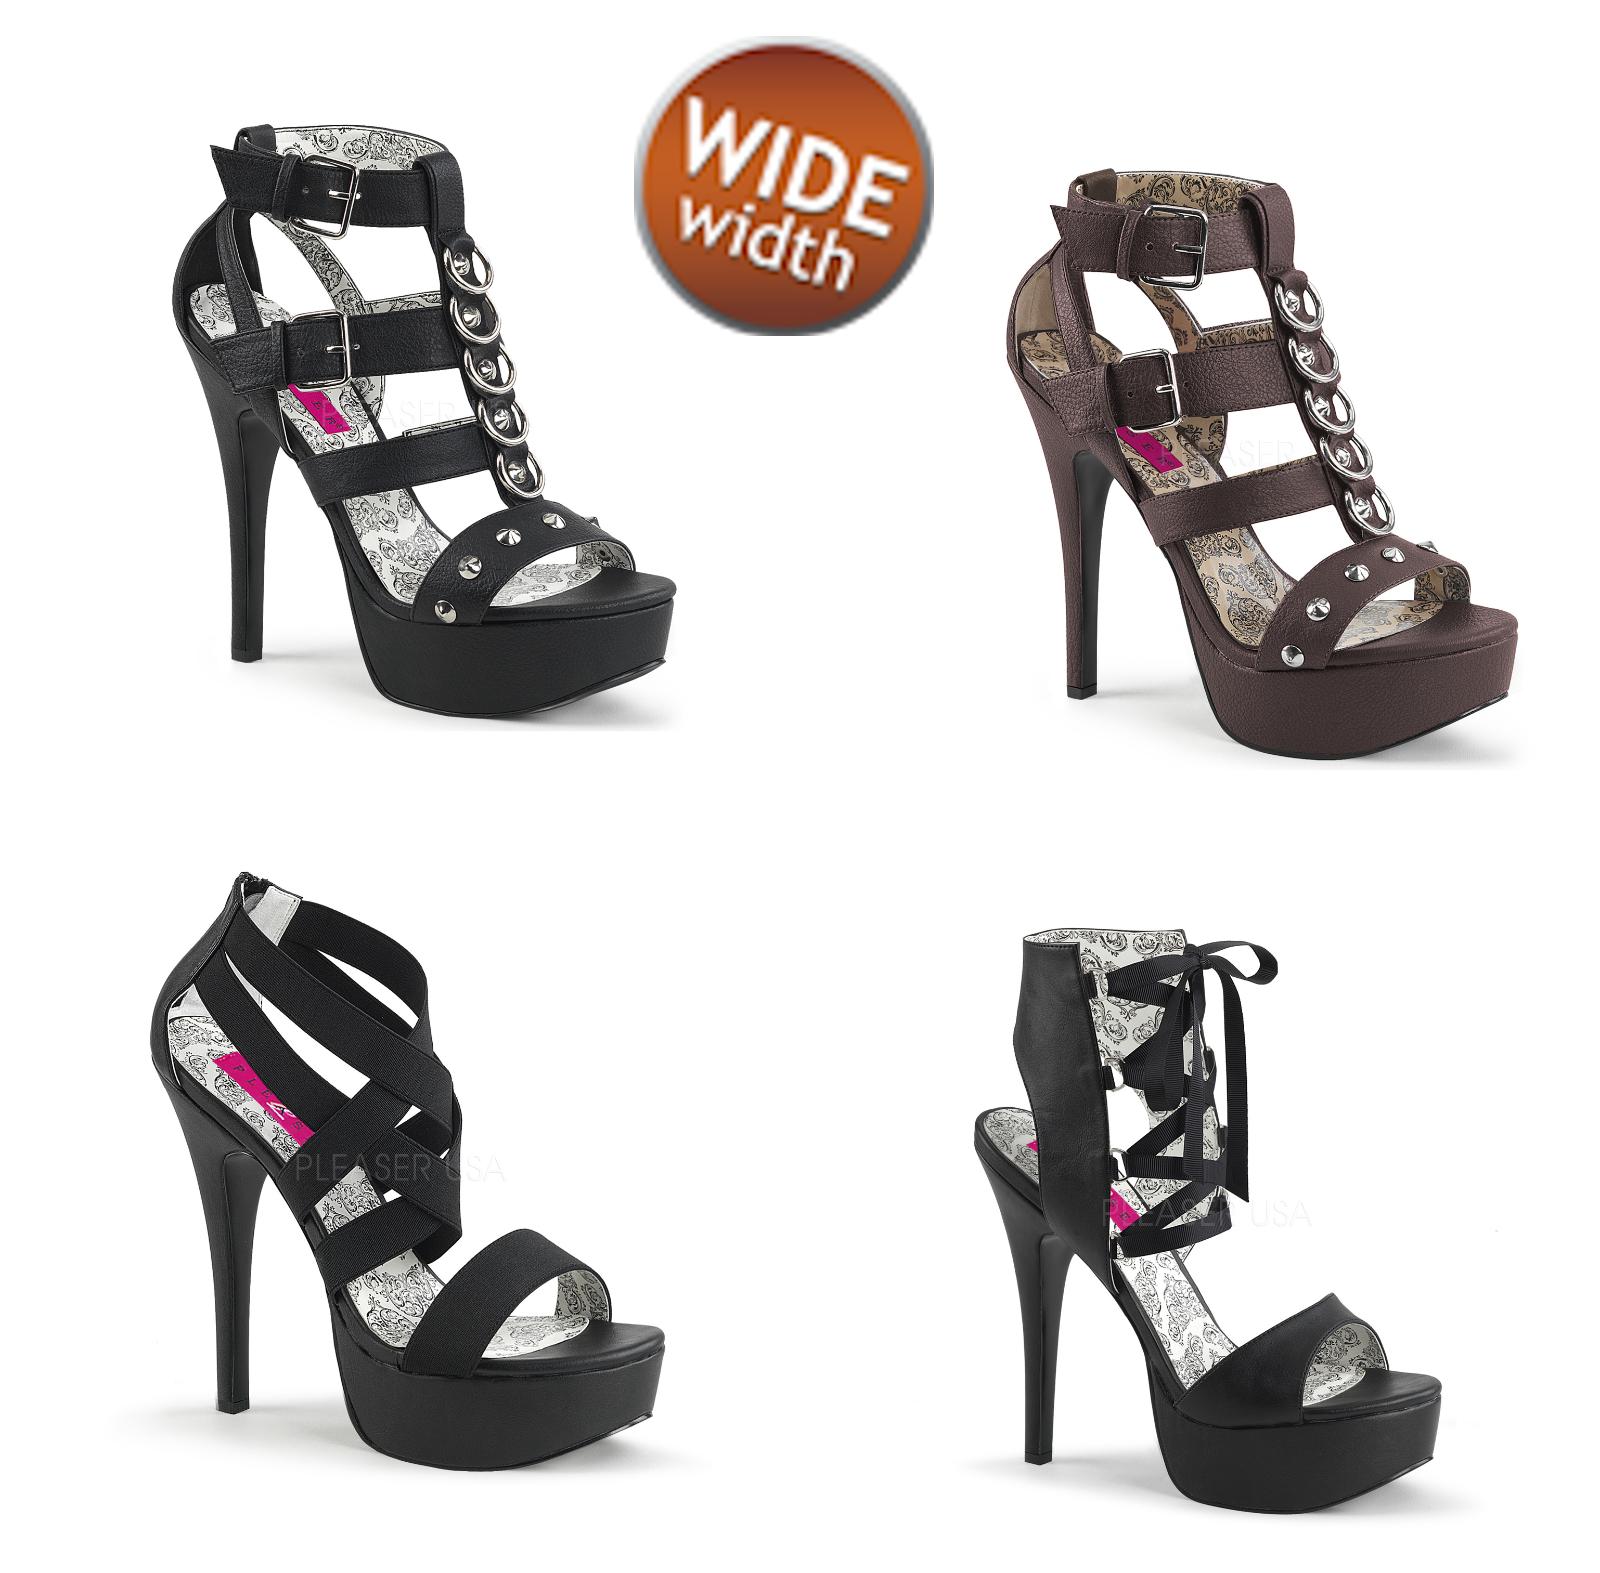 Pleaser rosa Label Wide Width TEEZE-42W TEEZE-47W TEEZE-49W Sandal Dimensione 11-16